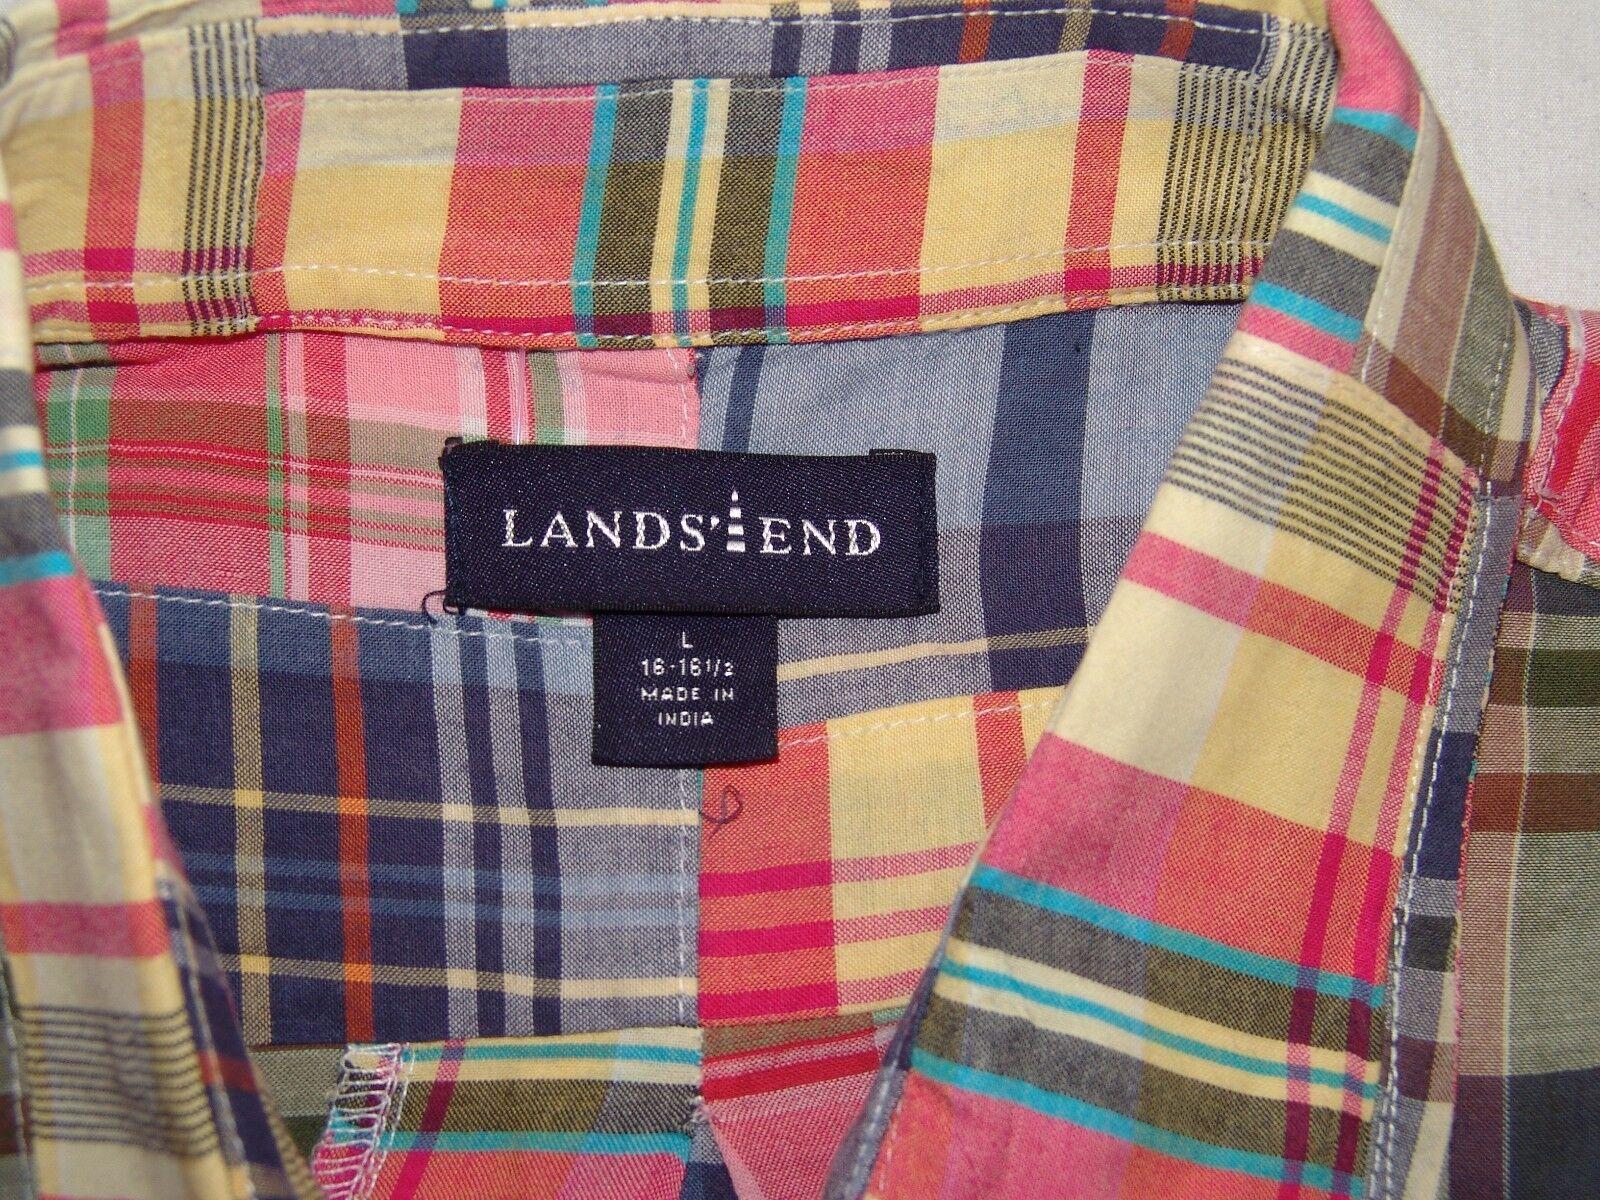 Lands Lands Lands End Madras Patchwork Knopfverschluss Hemd L 16 16 1 2 Herren Freizeit | Vogue  115a93